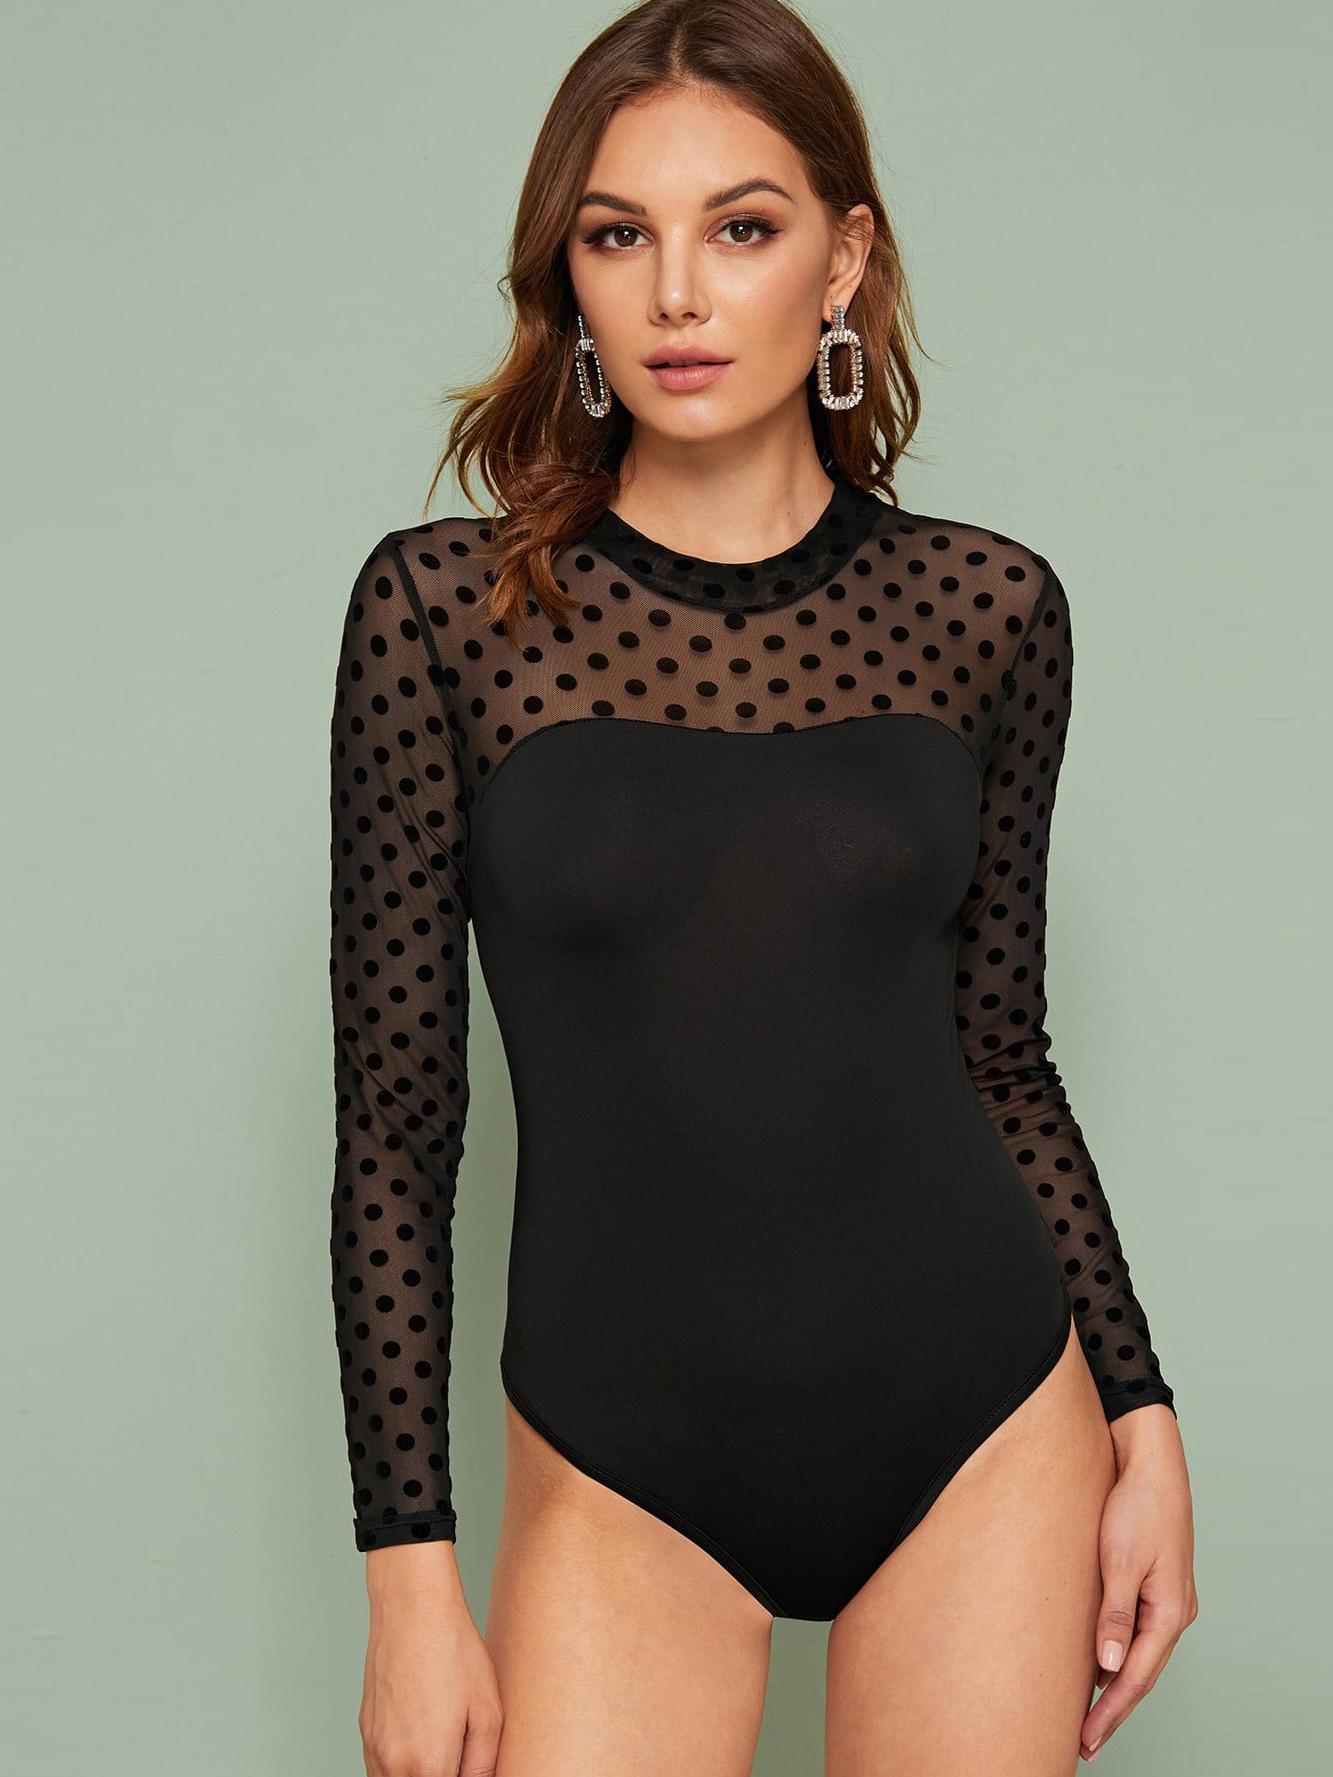 Perspective Polka Dots Black Long Sleeve Bodysuit